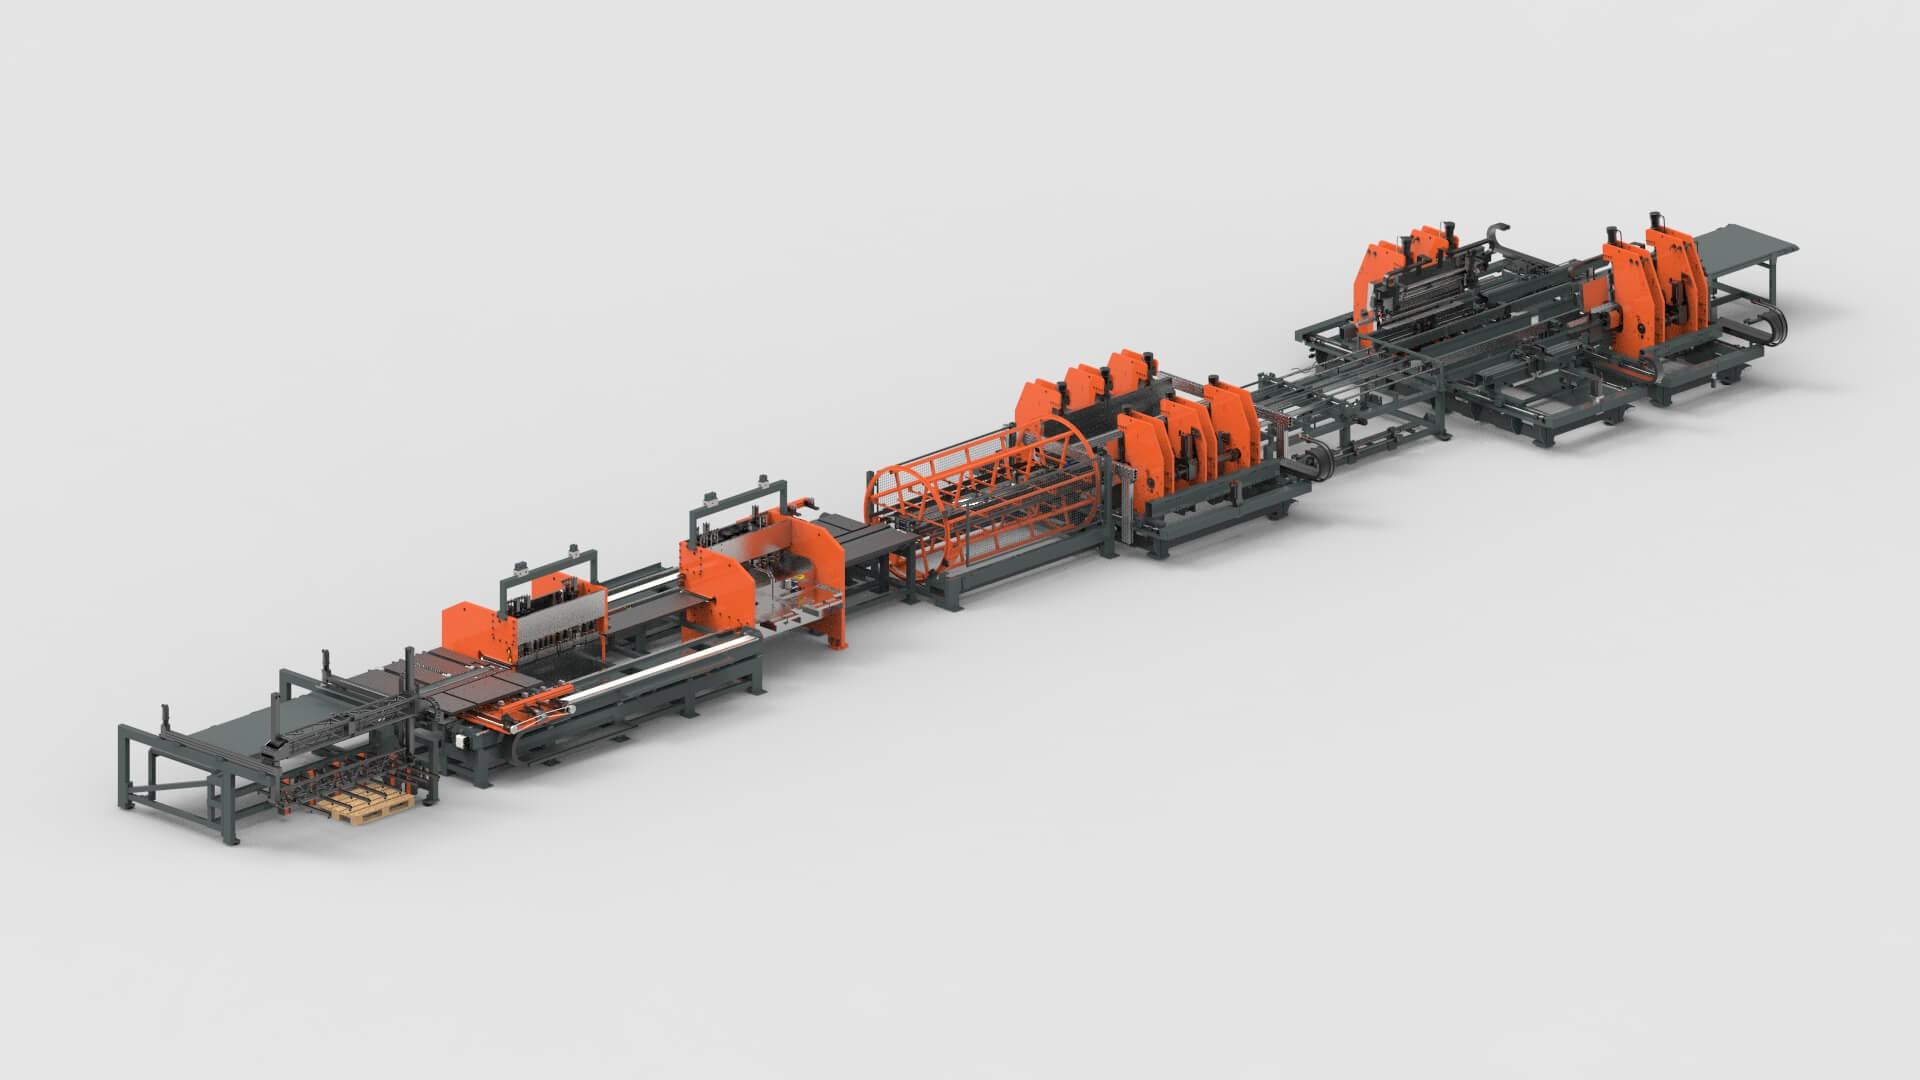 wemo-steel-cabinets-sheet-metal-punching-bending-production-line.jpg